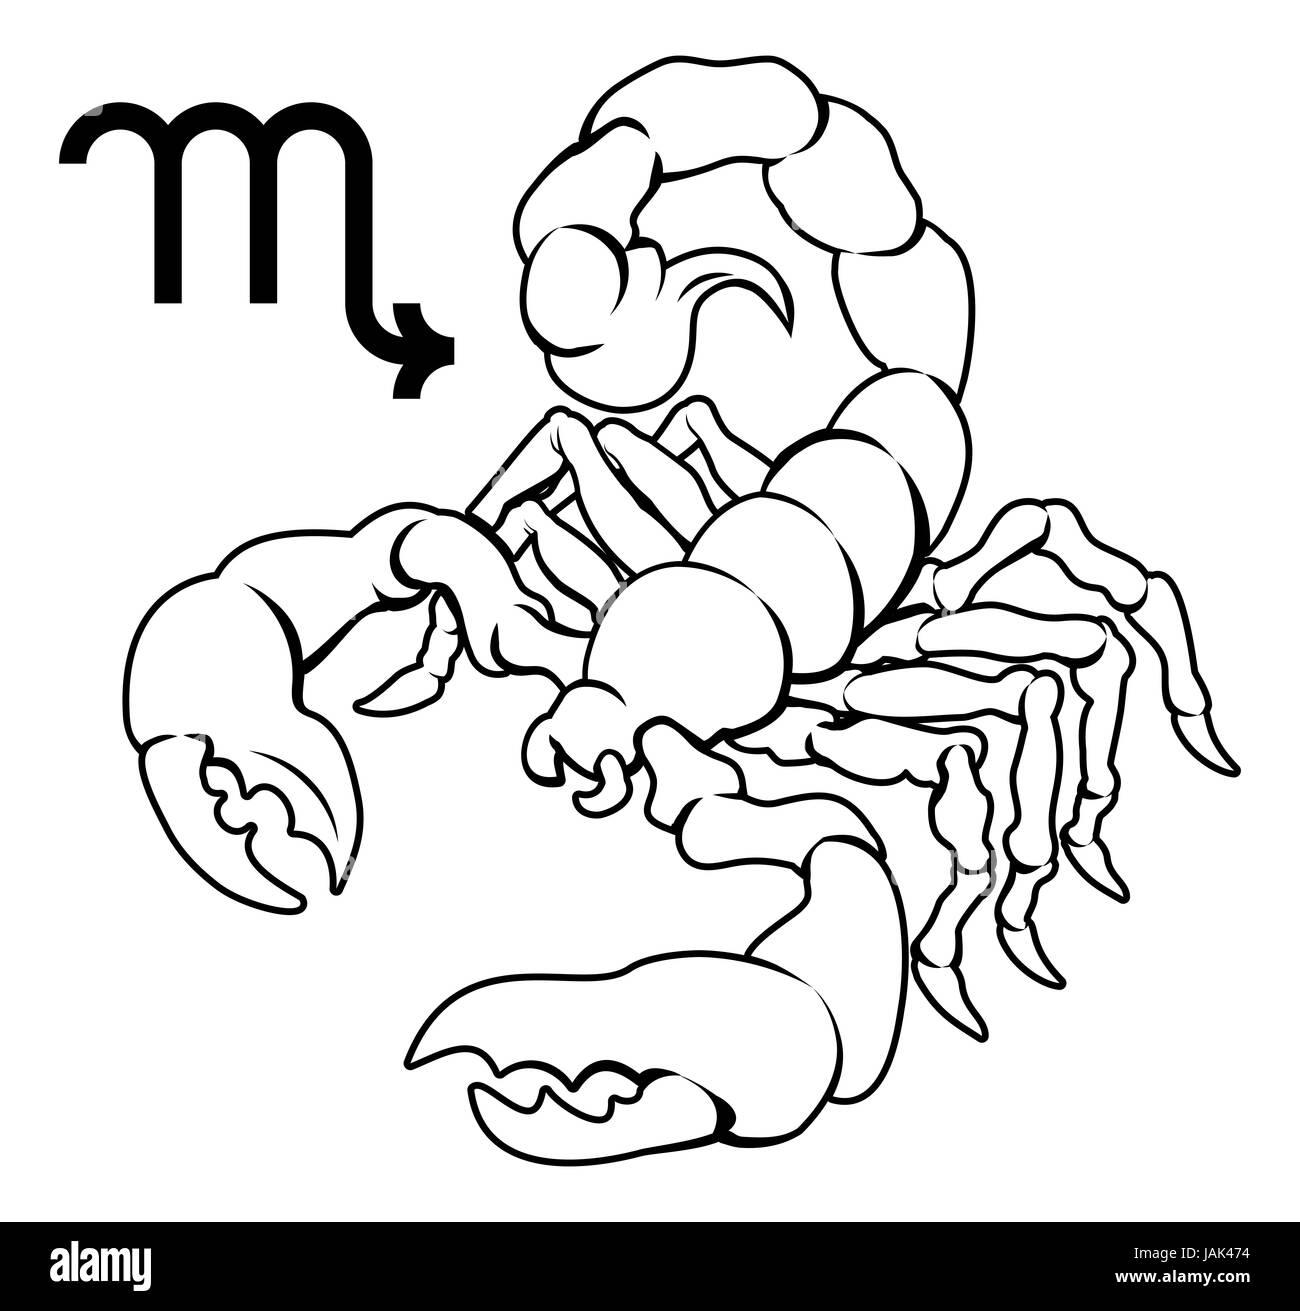 scorpio symbol horoscope zodiac graphic stockfotos scorpio symbol horoscope zodiac graphic. Black Bedroom Furniture Sets. Home Design Ideas